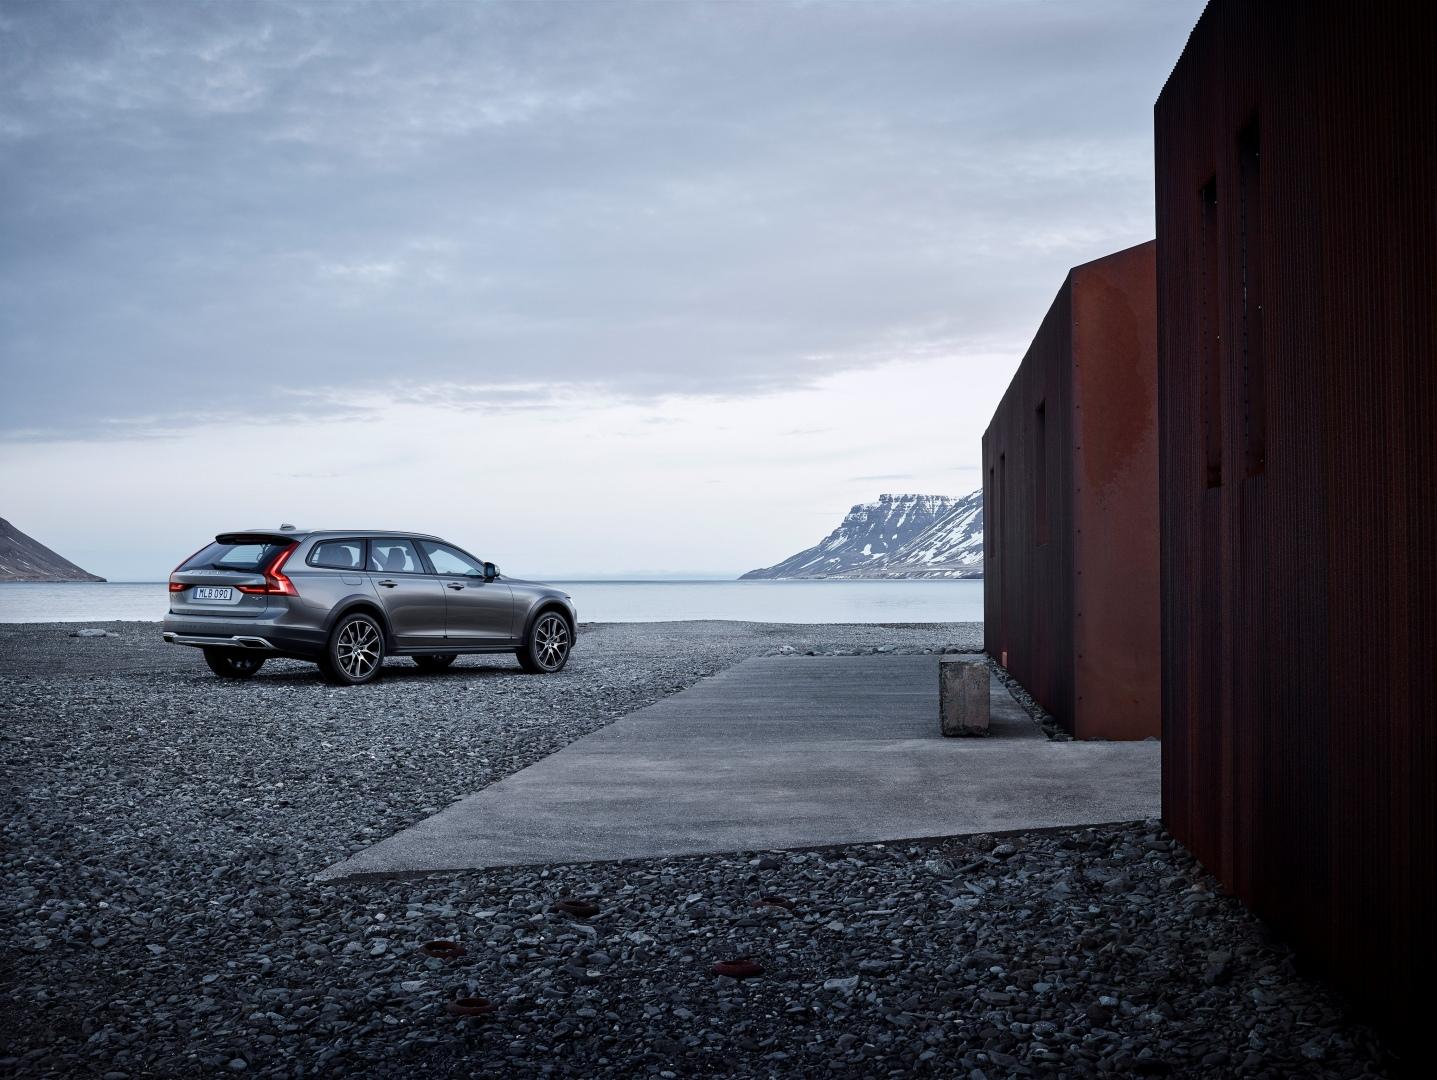 198325_New_Volvo_V90_Cross_Country_location